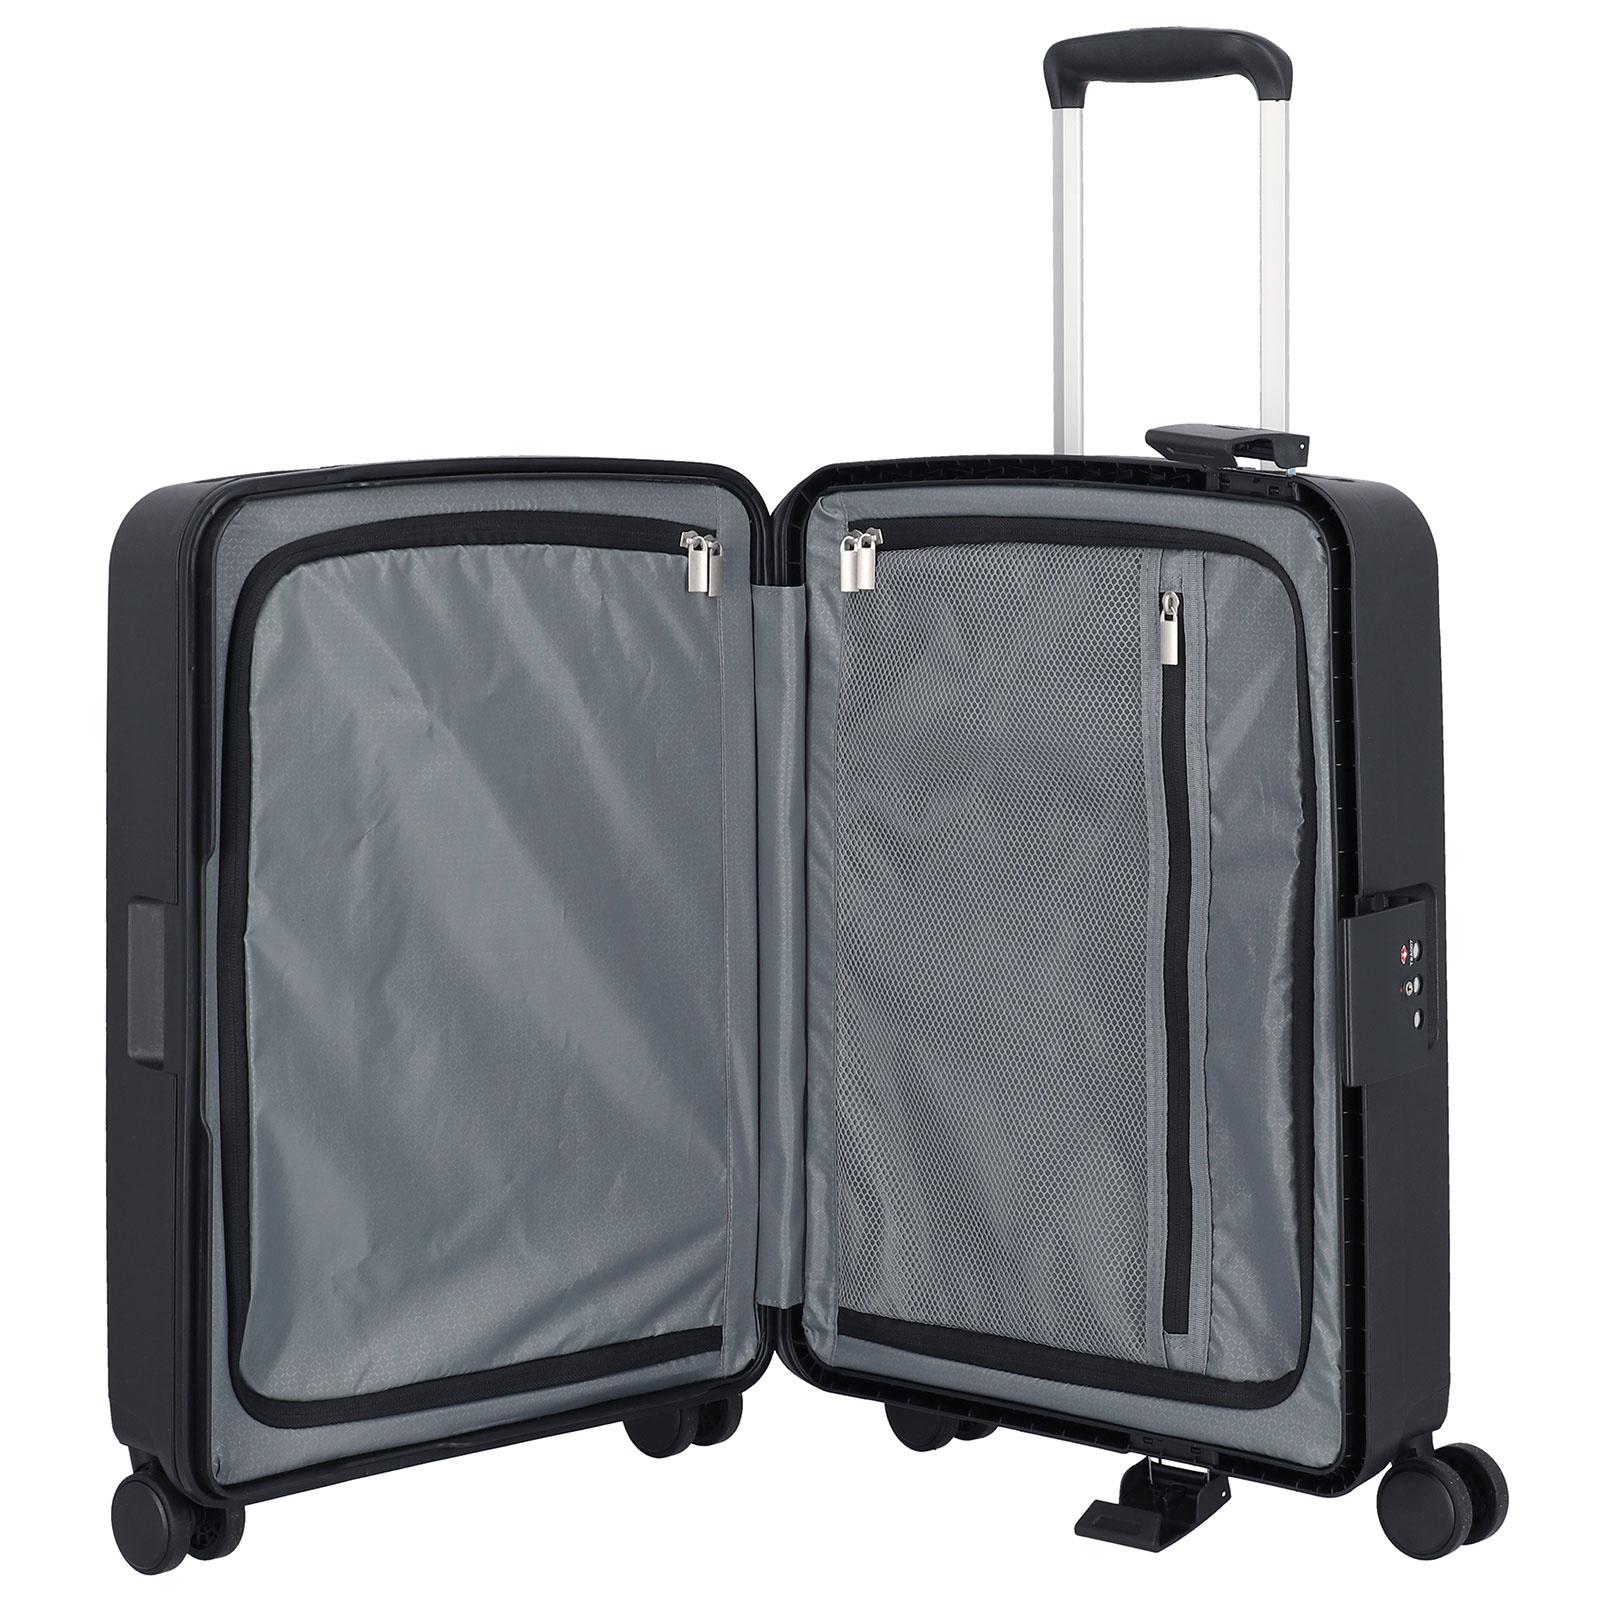 Travelite Terminal Spinner 55 cm handbagagekoffer - Black - harde koffer zonder rits